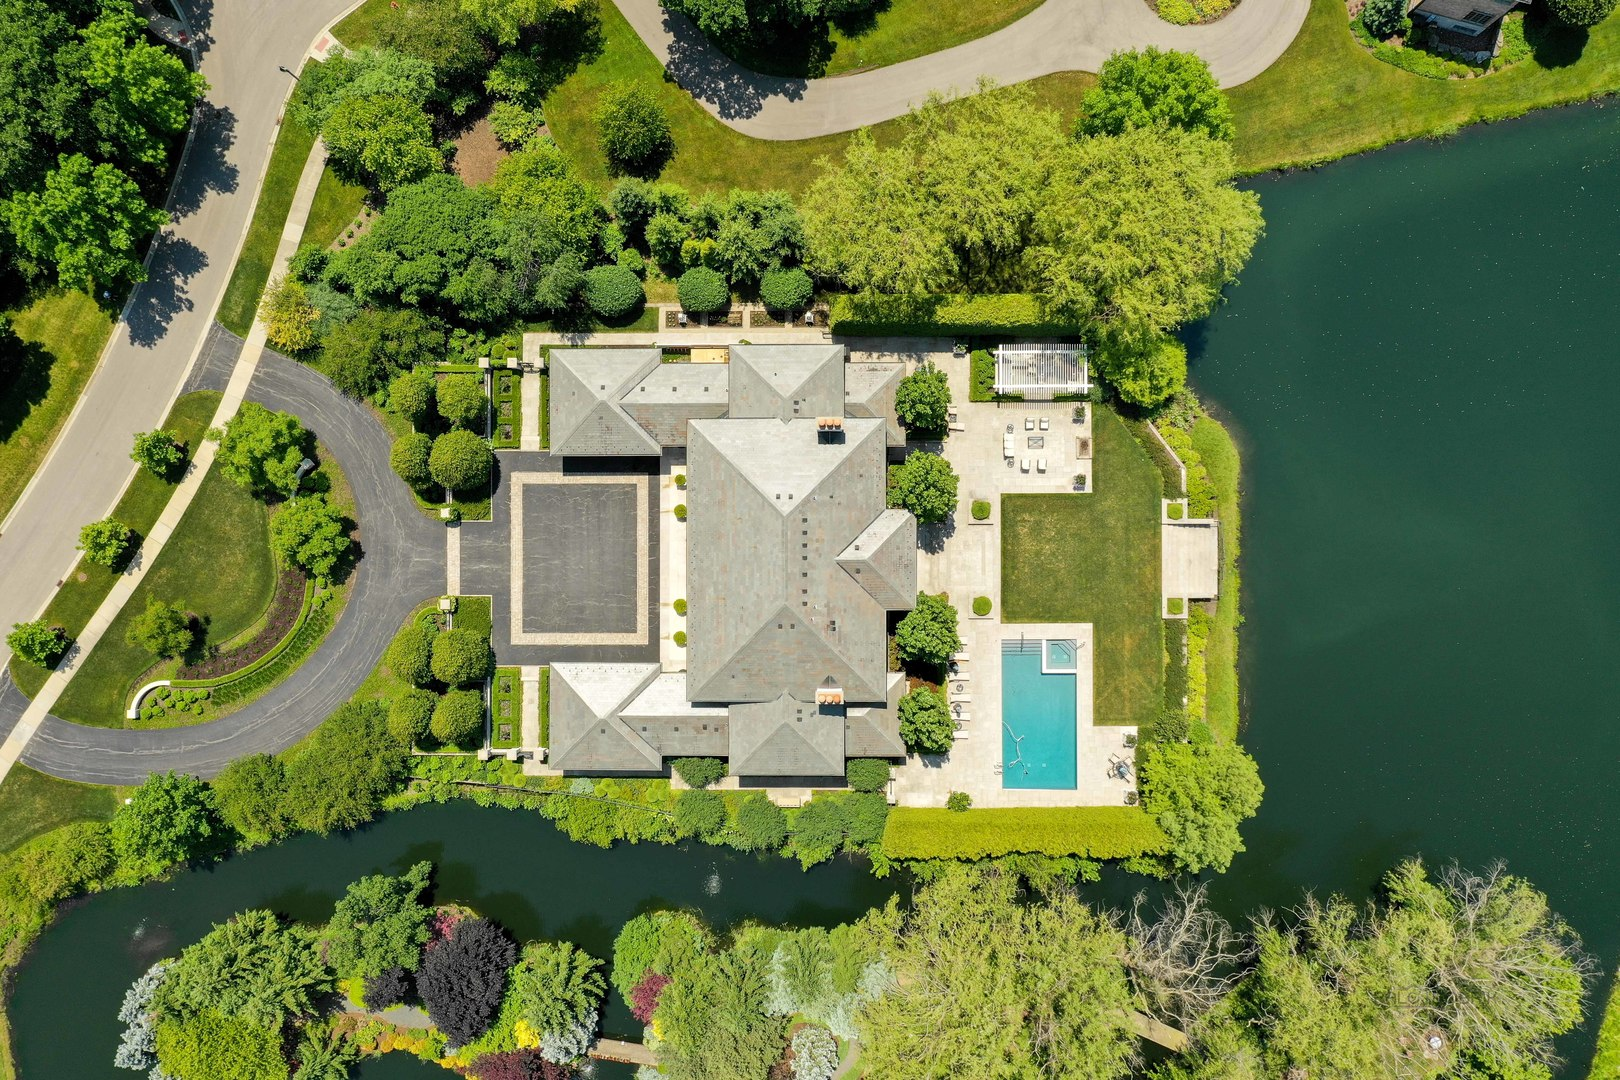 1230 West Summerfield, Lake Forest, Illinois, 60045